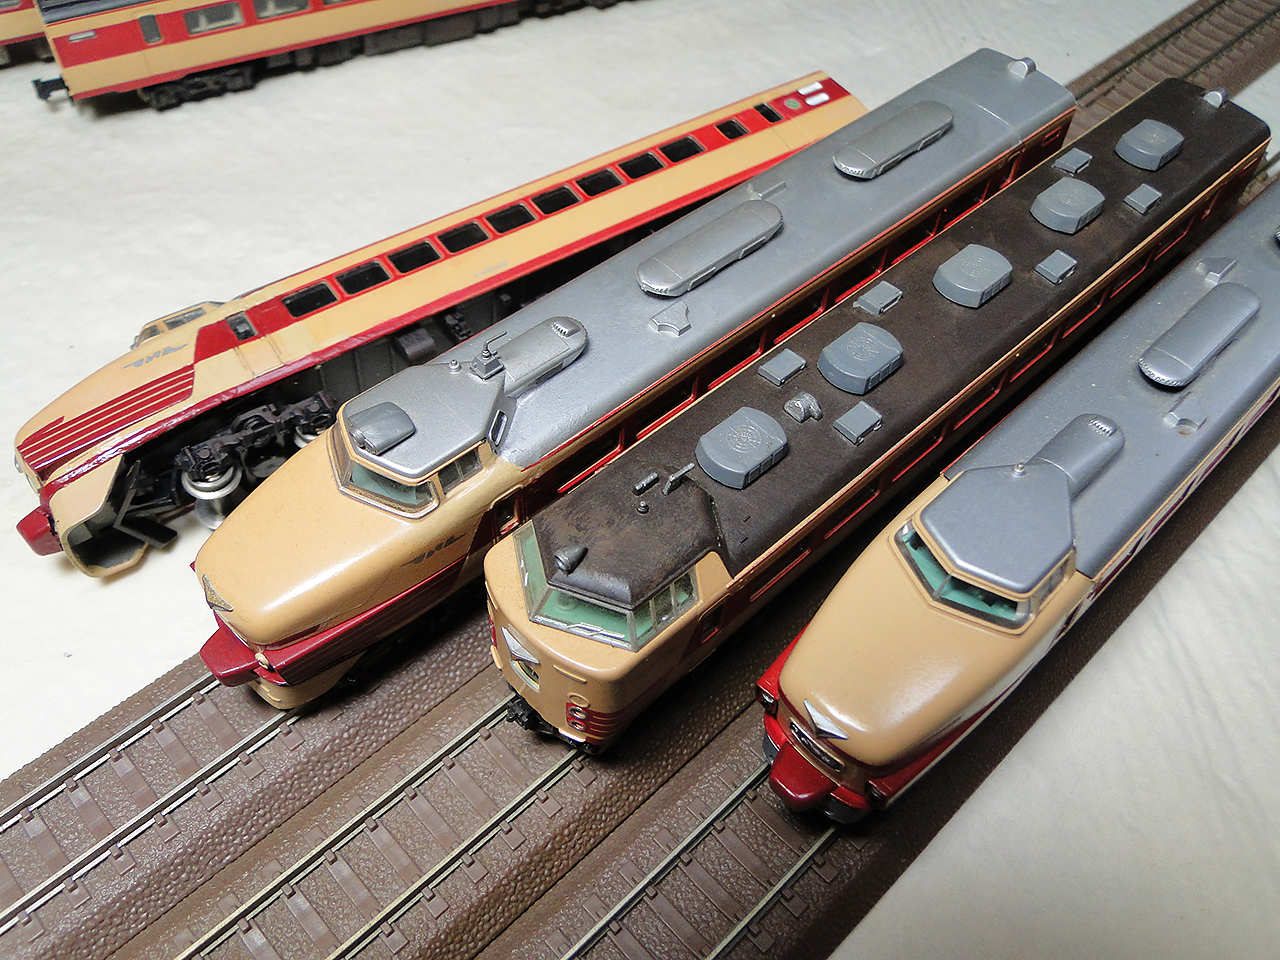 http://moritetsu.info/model-railway/img/DSC06645ss.jpg